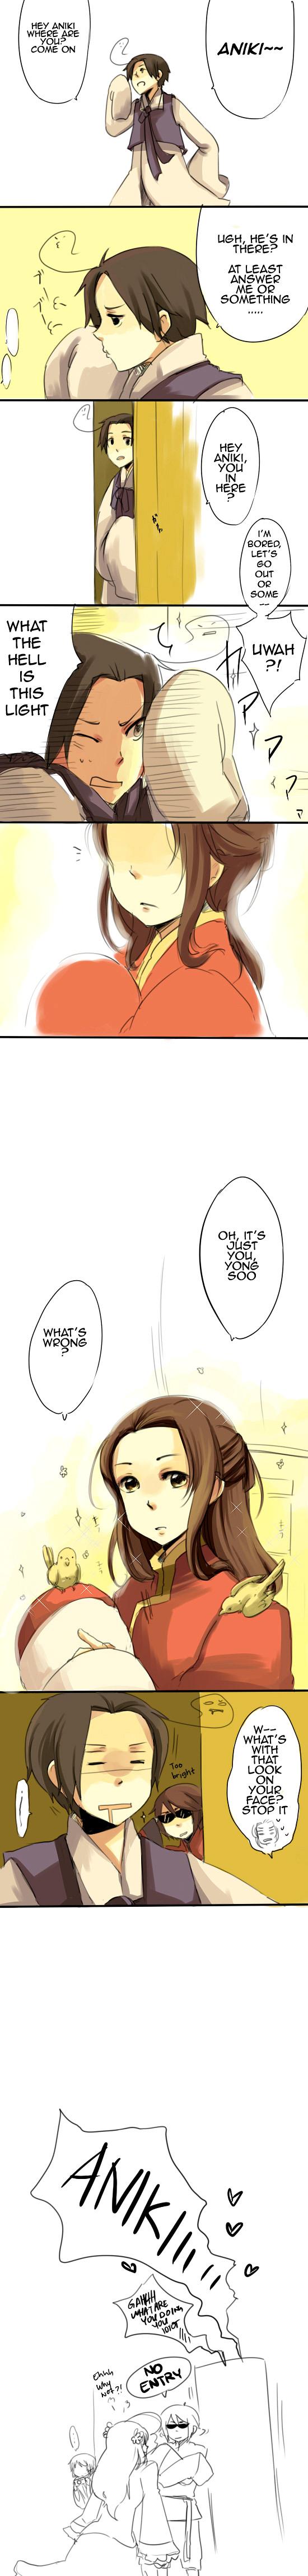 Tags: Anime, Ryo-hakkai, Axis Powers: Hetalia, South Korea, Japan, Taiwan, China, Hong Kong, Pixiv, Comic, Asian Countries